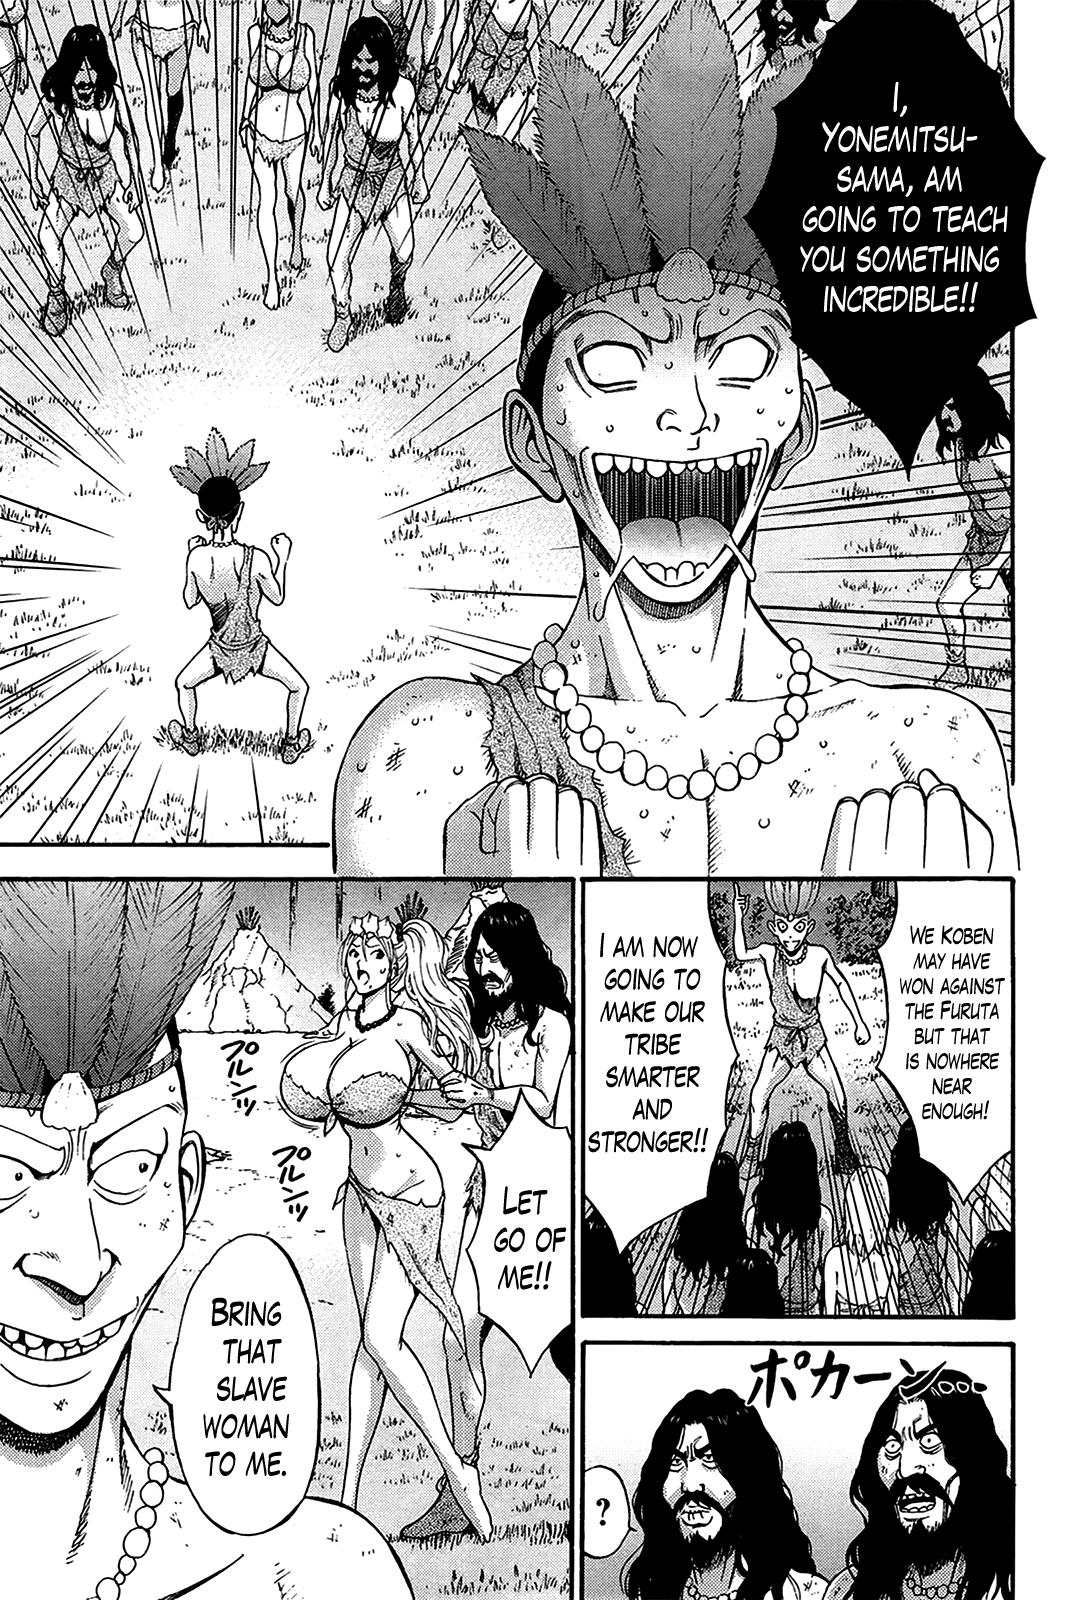 Kigenzen 10000 Nen no Ota   The Otaku in 10,000 B.C. Ch. 1-22 240